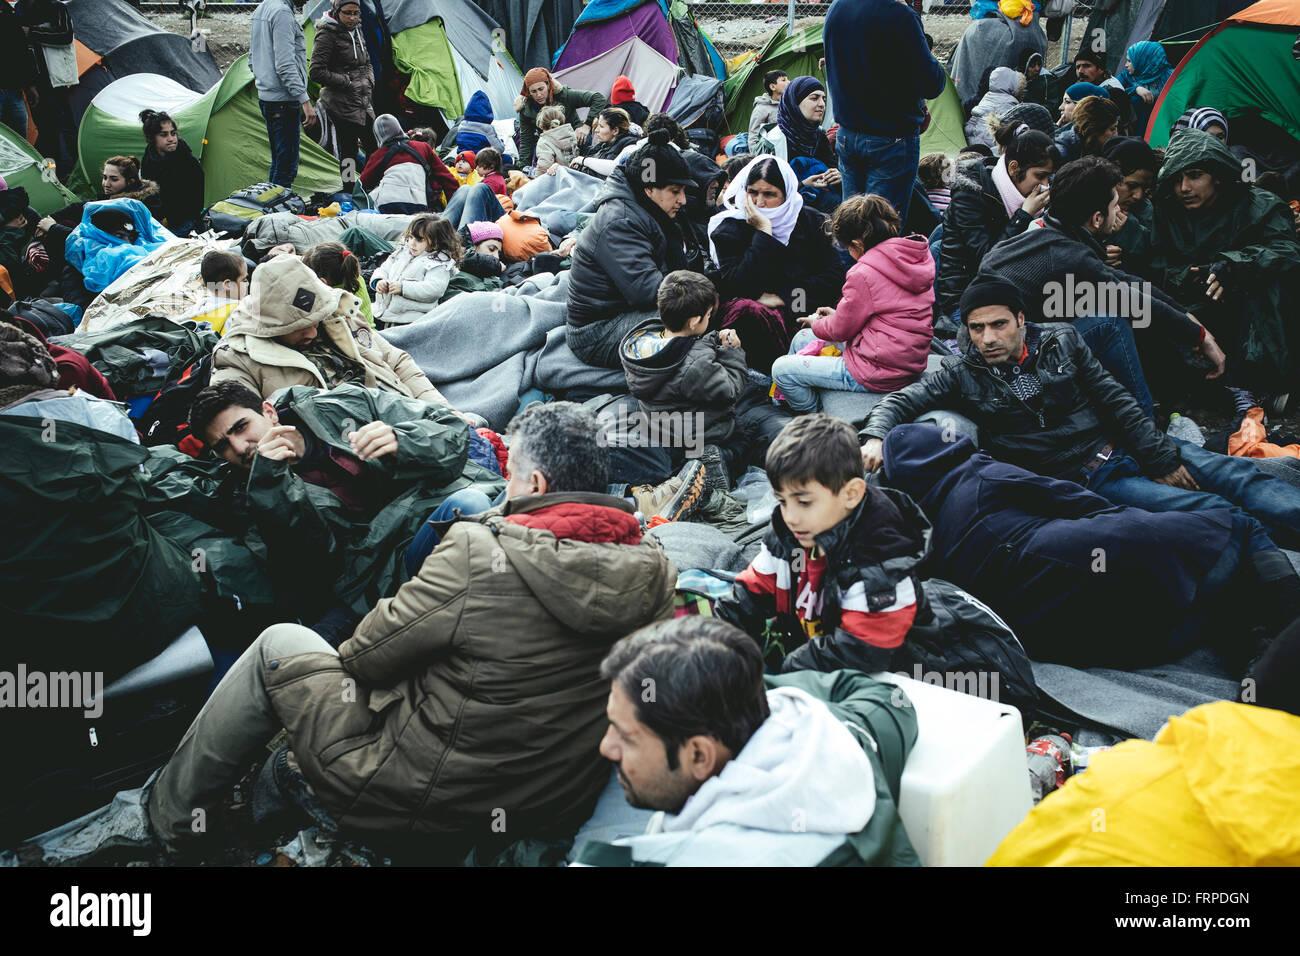 Idomeni refugee camp on the Greece-Macedonia border, refugees waiting at a checkpoint, Idomeni, Central Macedonia, - Stock Image